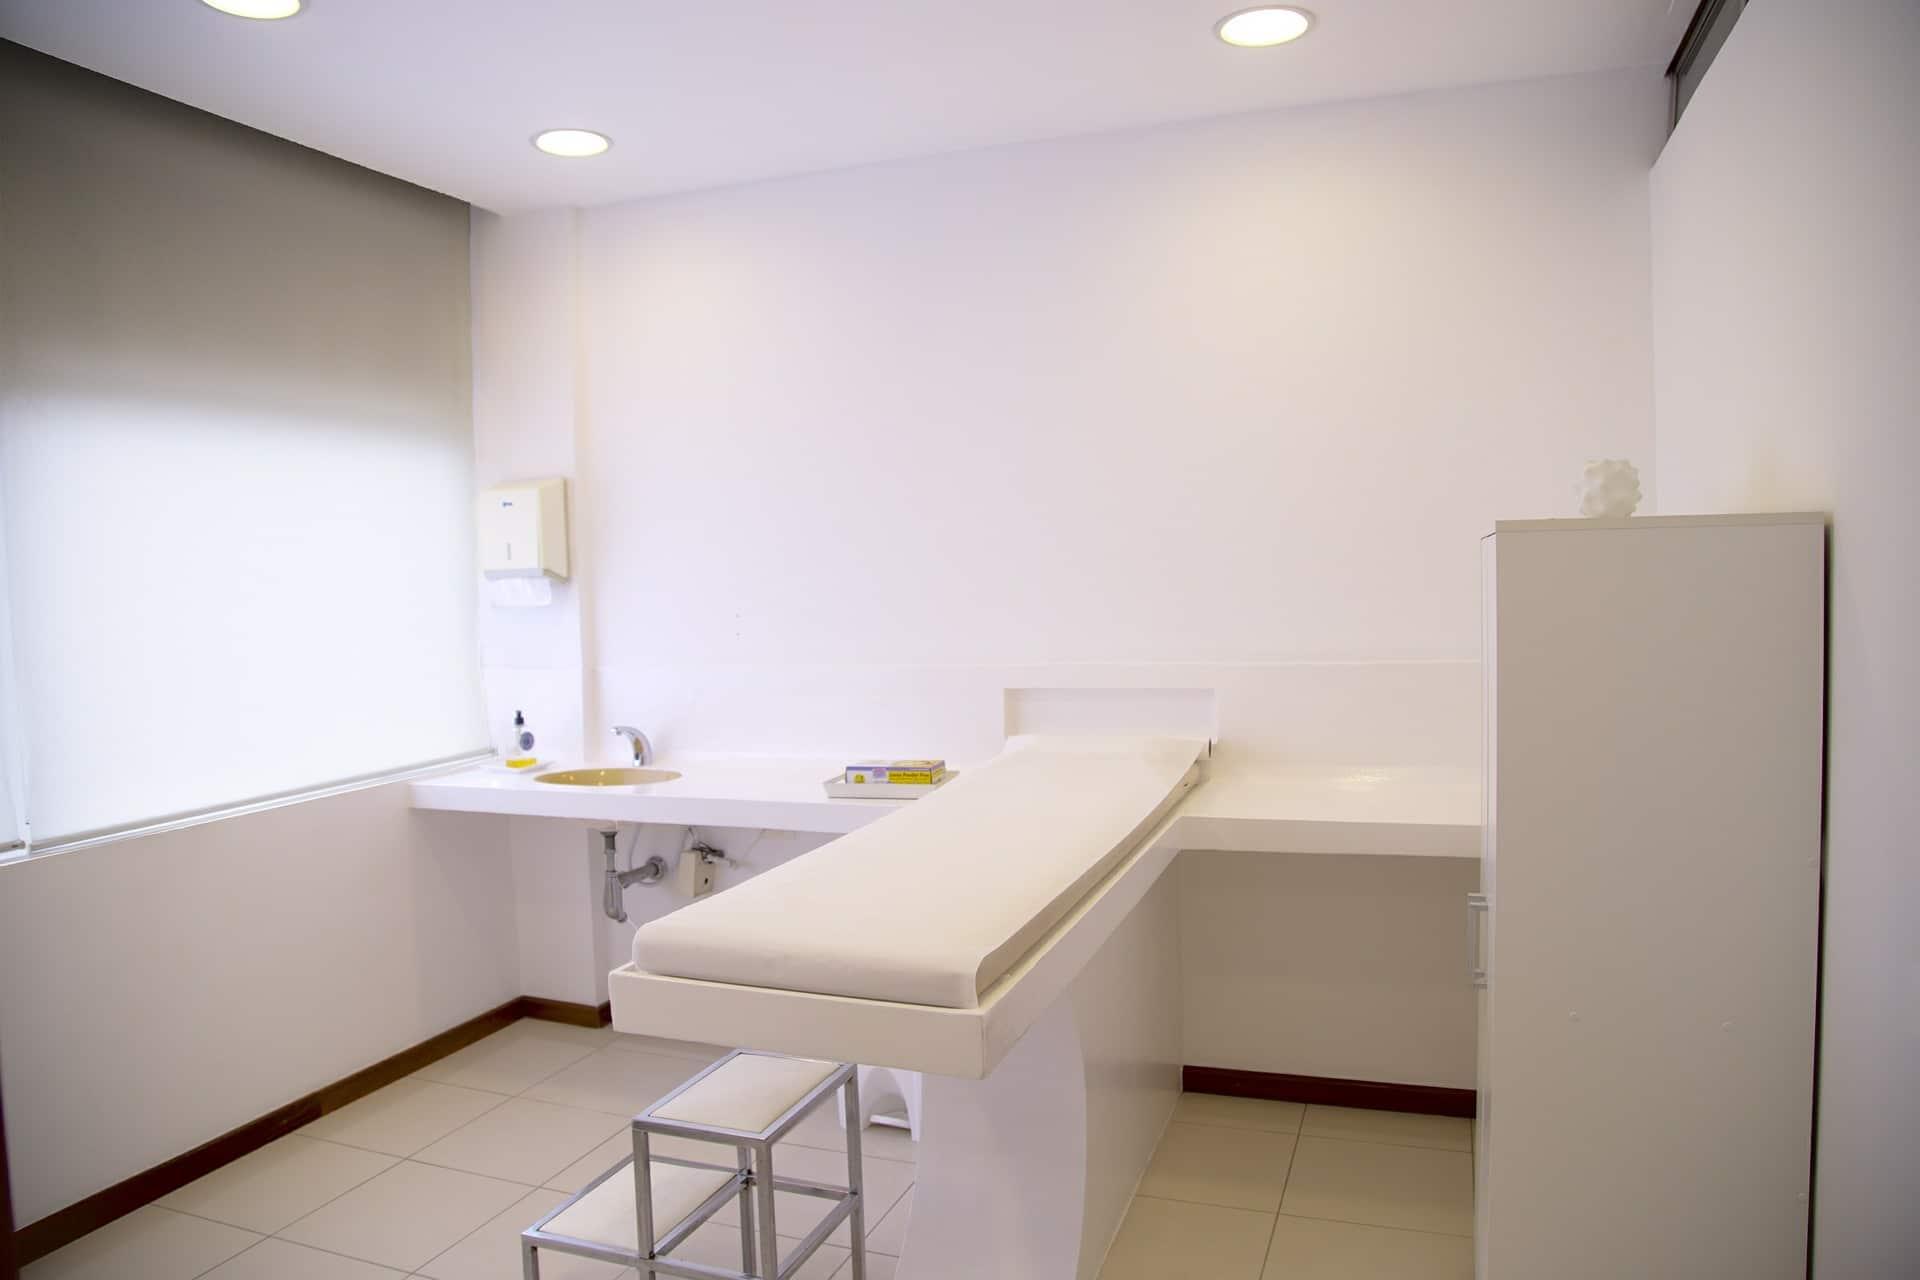 Consultório de Enfermagem